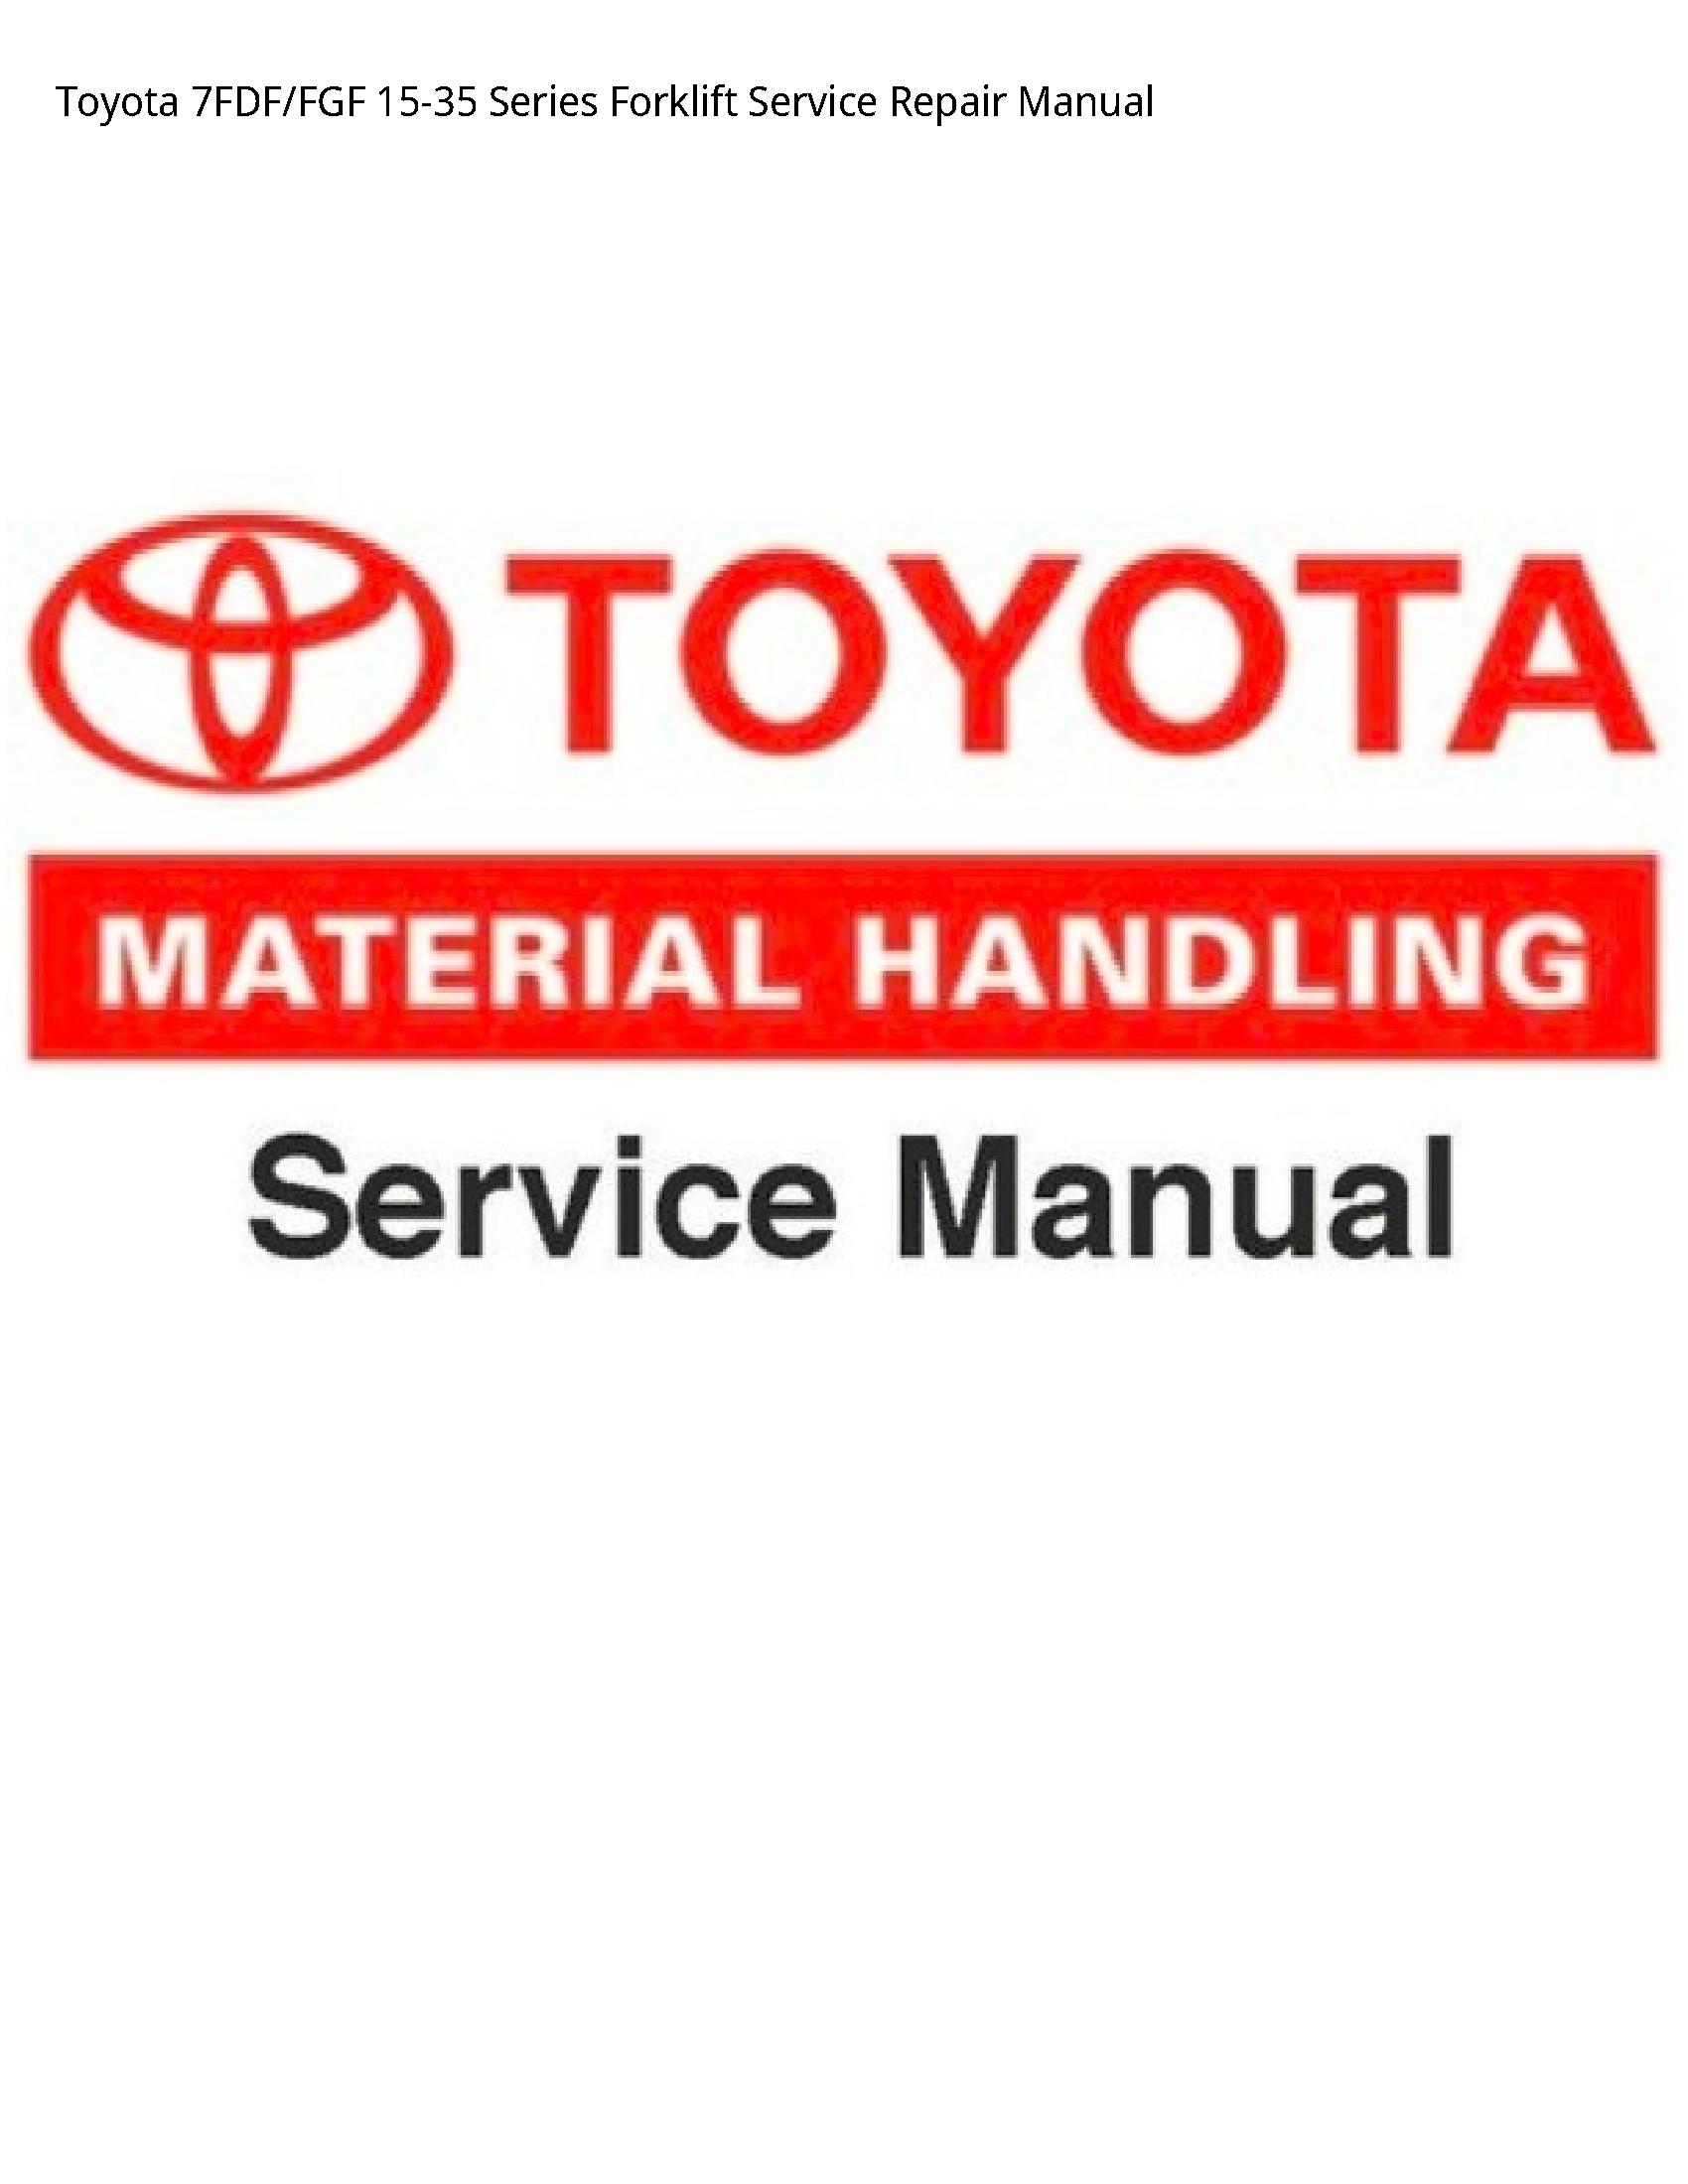 Toyota 7FDF Series Forklift manual